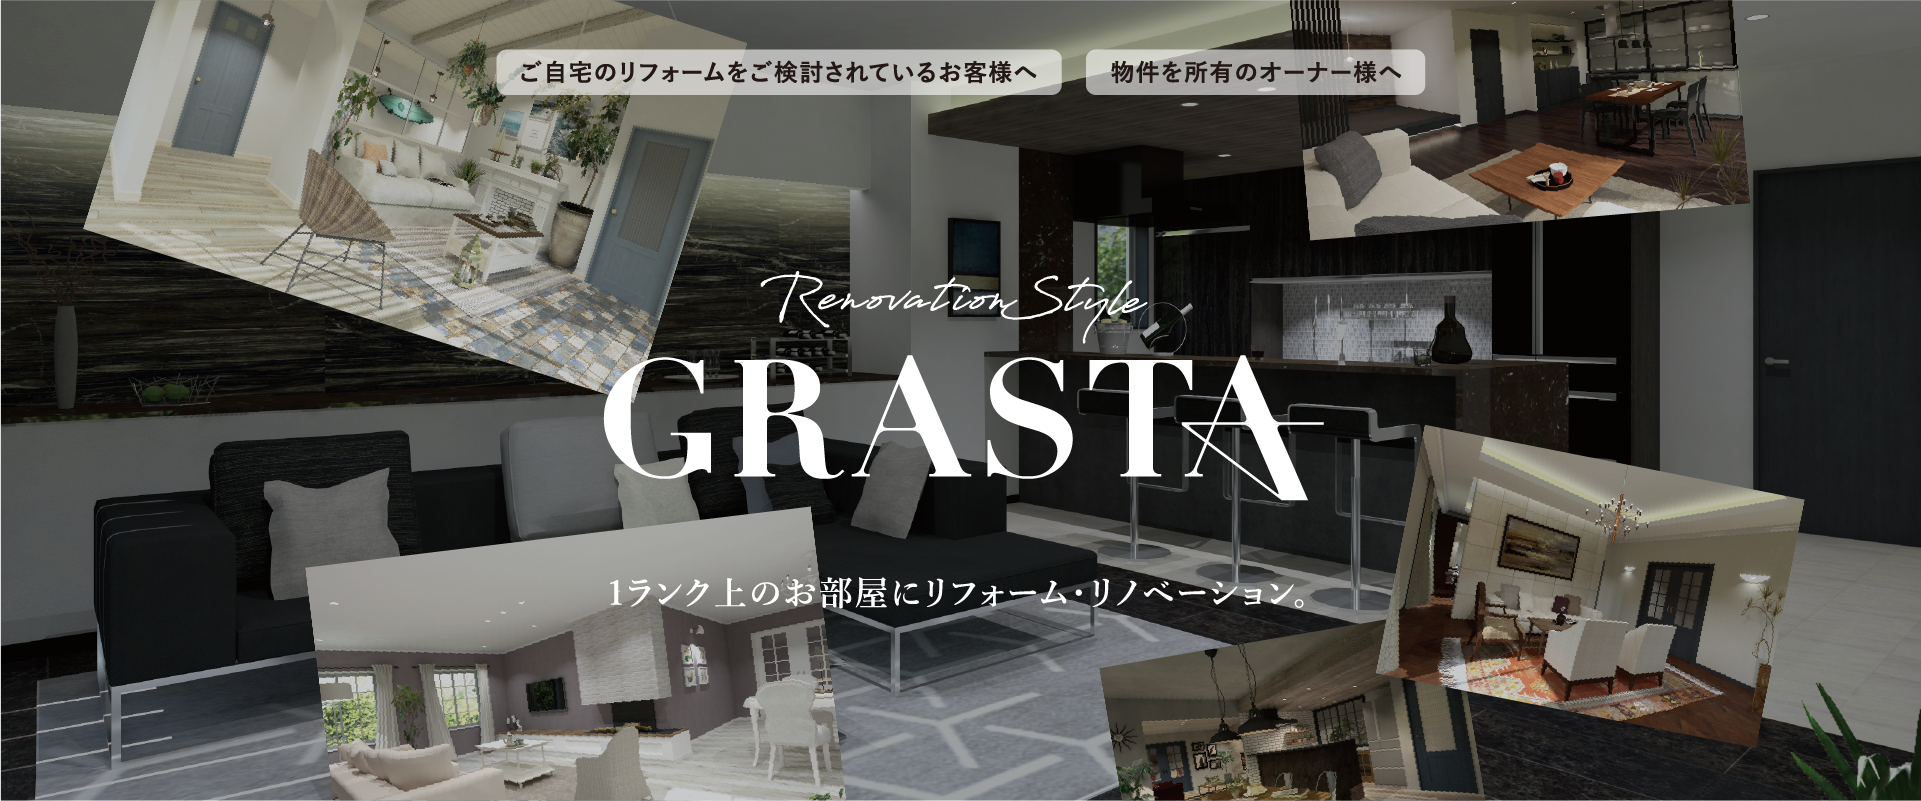 GRASTAワンランク上のお部屋にリフォーム・リノベーション